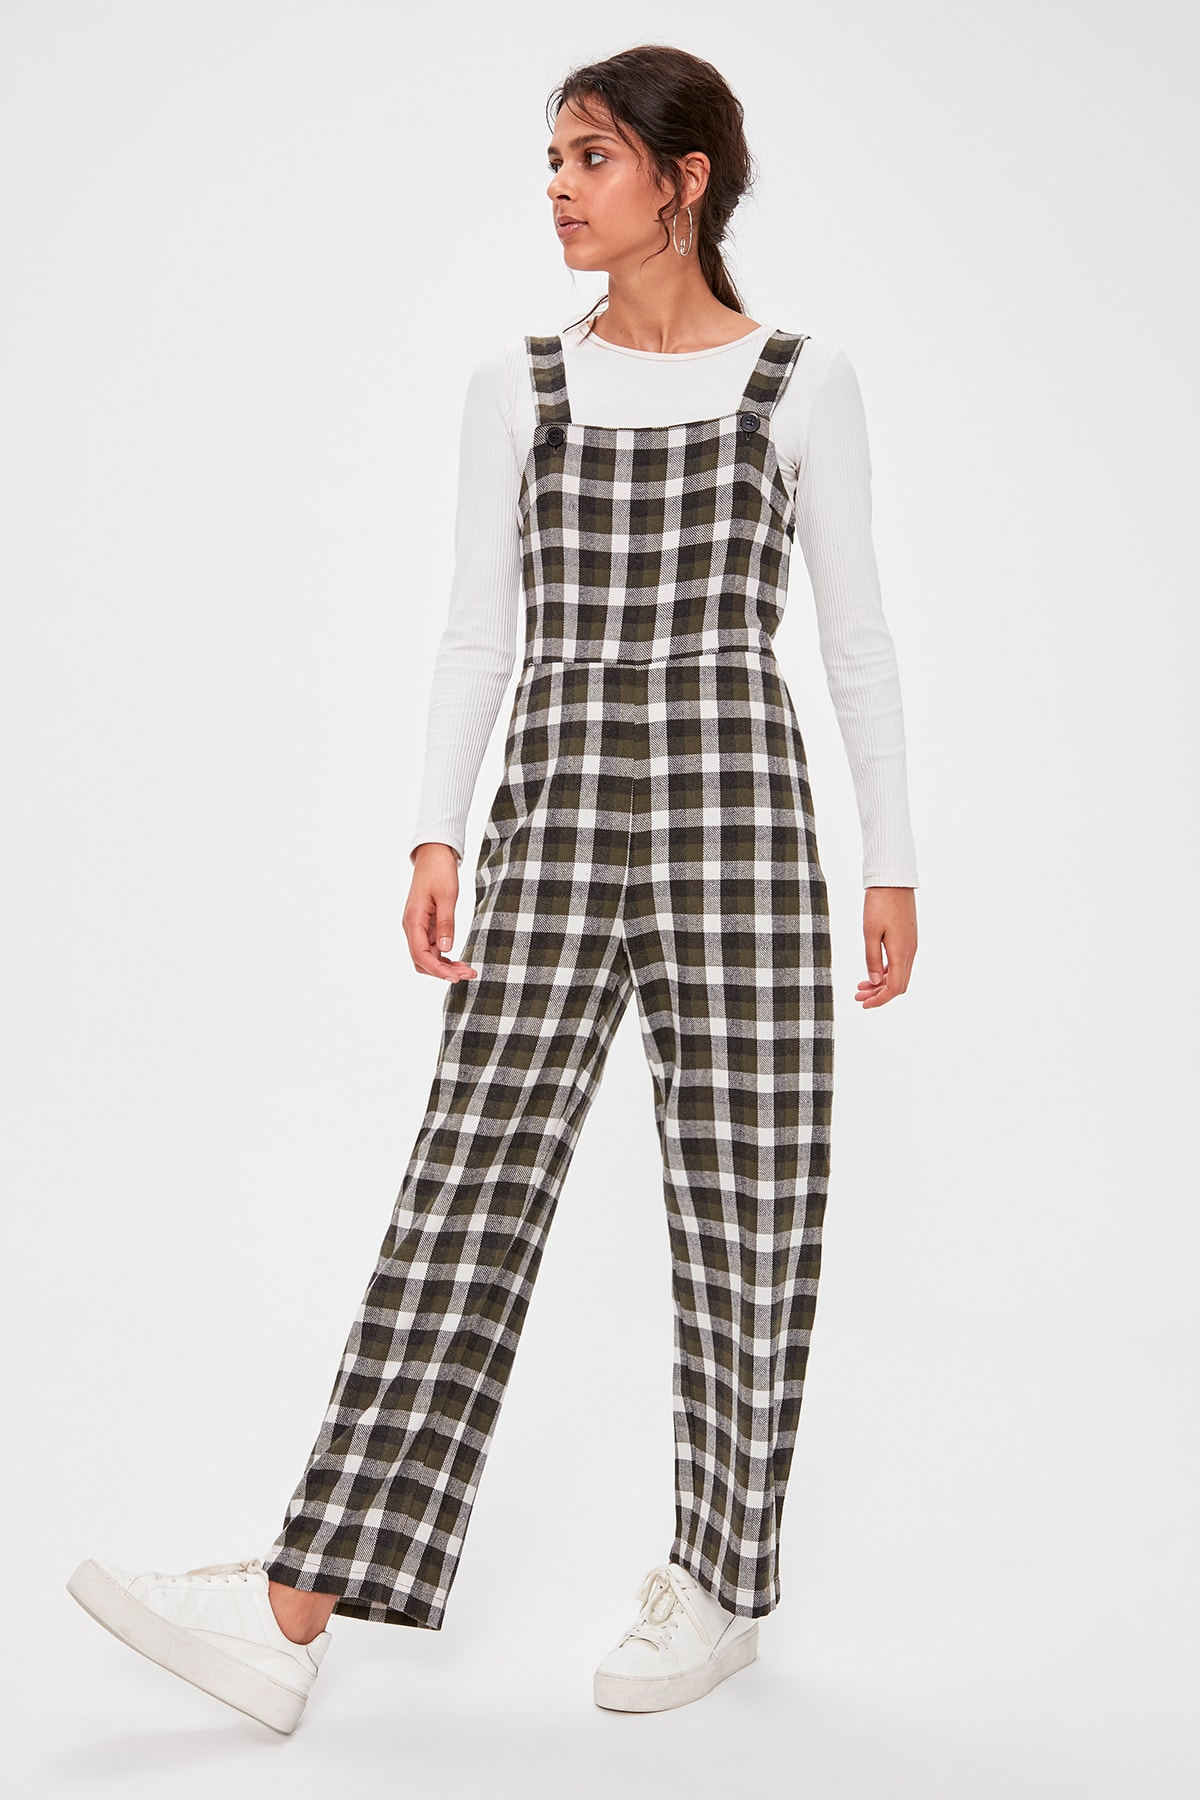 Trendyol Khaki Plaids Jumpsuit TWOAW20TU0073